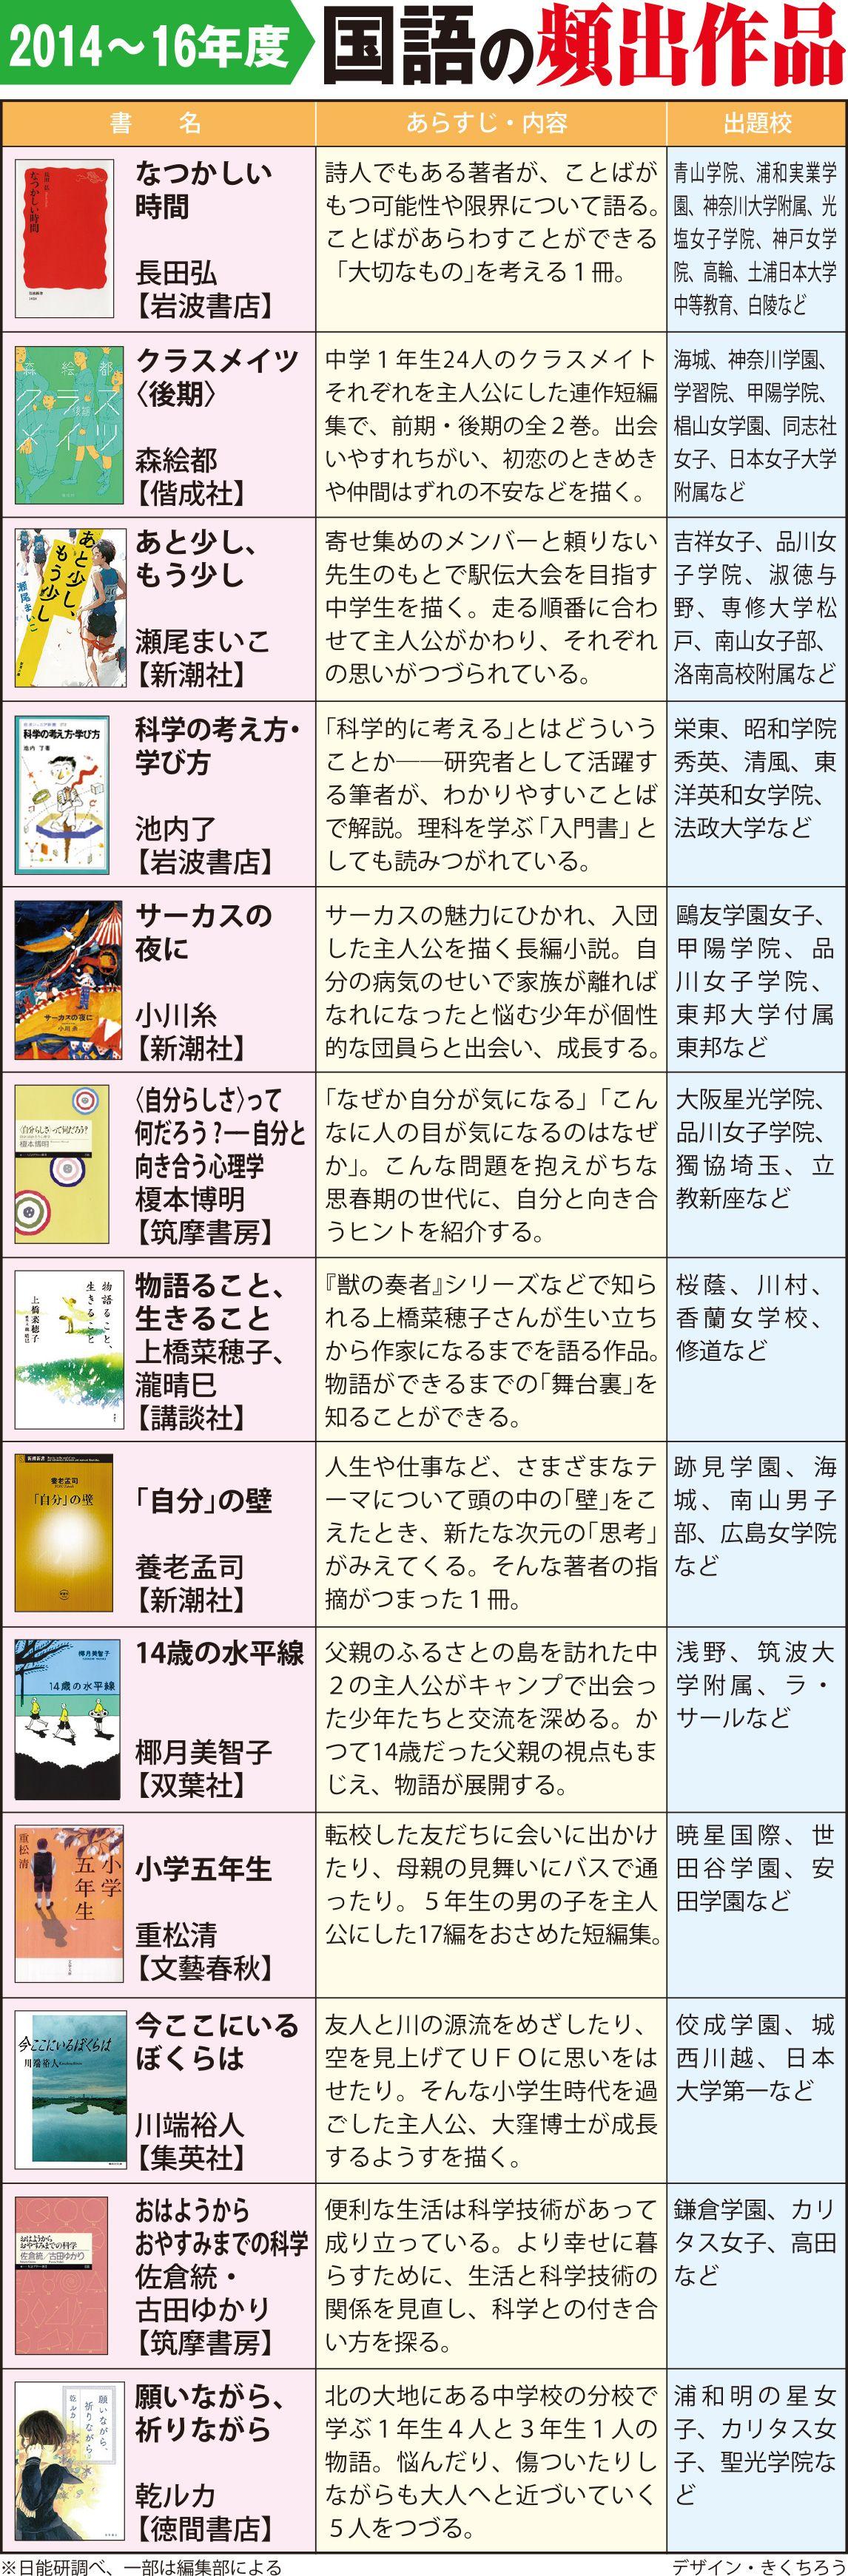 20160817_2_02